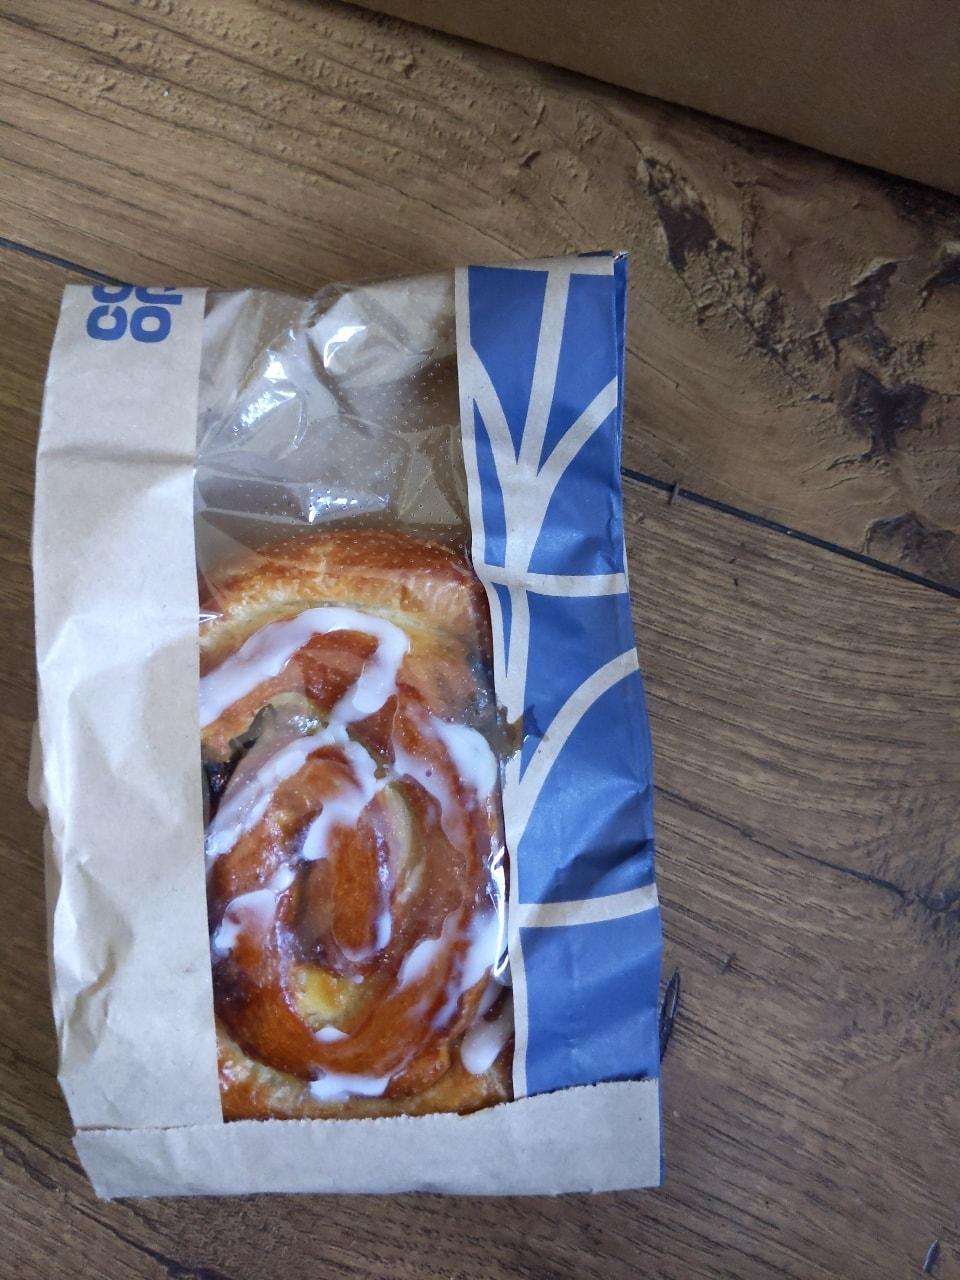 Pastry swirl